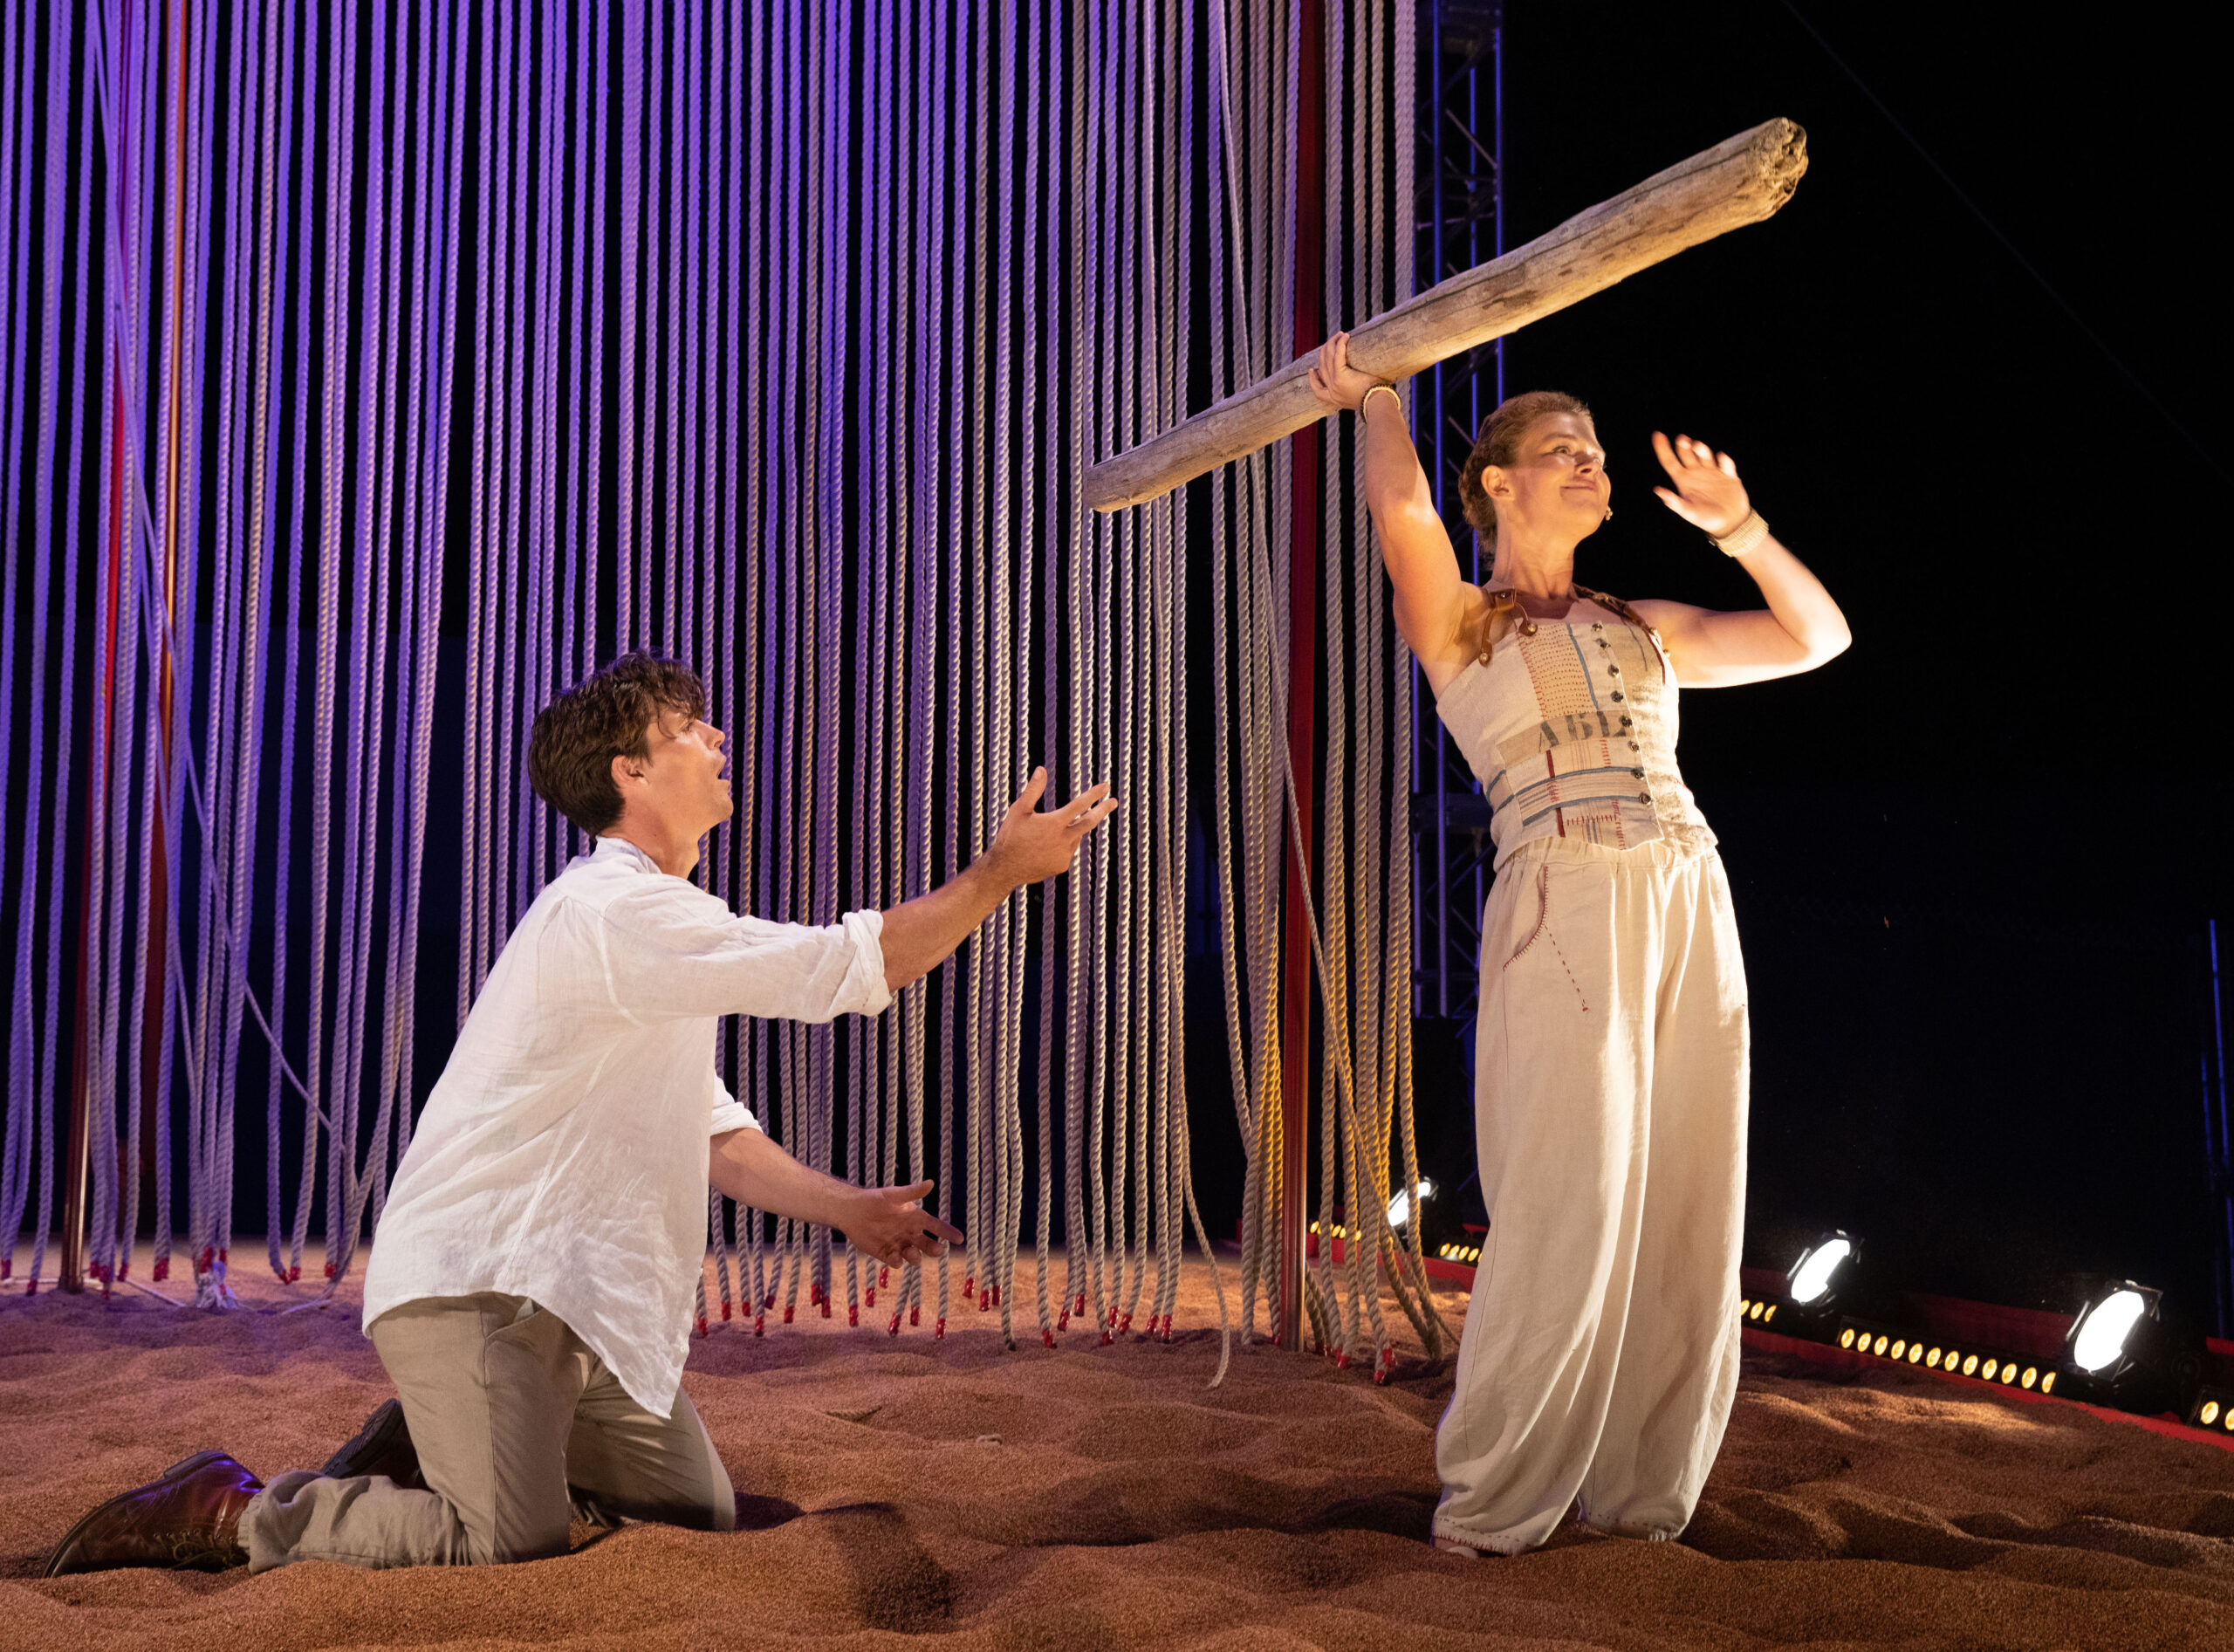 Michael Underhill (Ferdinand) and Nora Eschenheimer (Miranda) Photo by: Evgenia Eliseeva